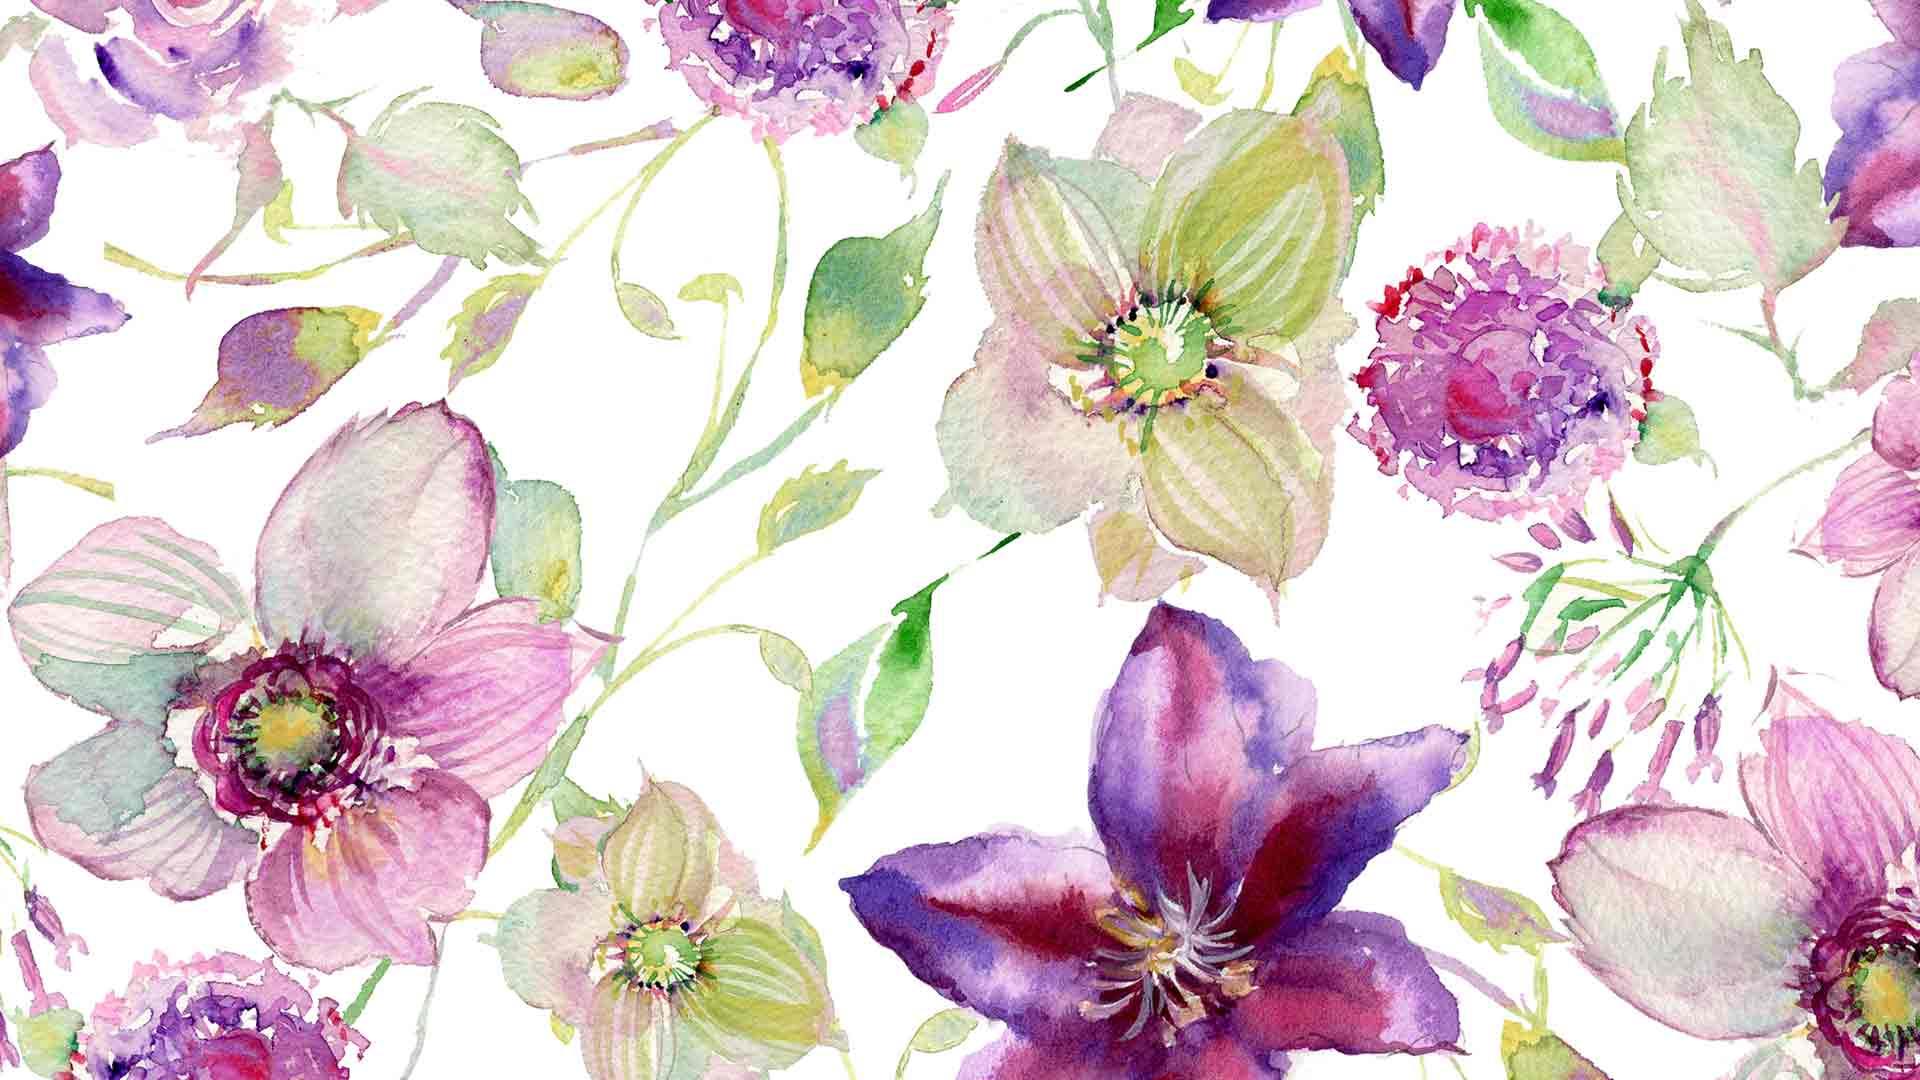 Watercolor Wallpaper Hd - Watercolor Flowers Wallpaper Hd , HD Wallpaper & Backgrounds